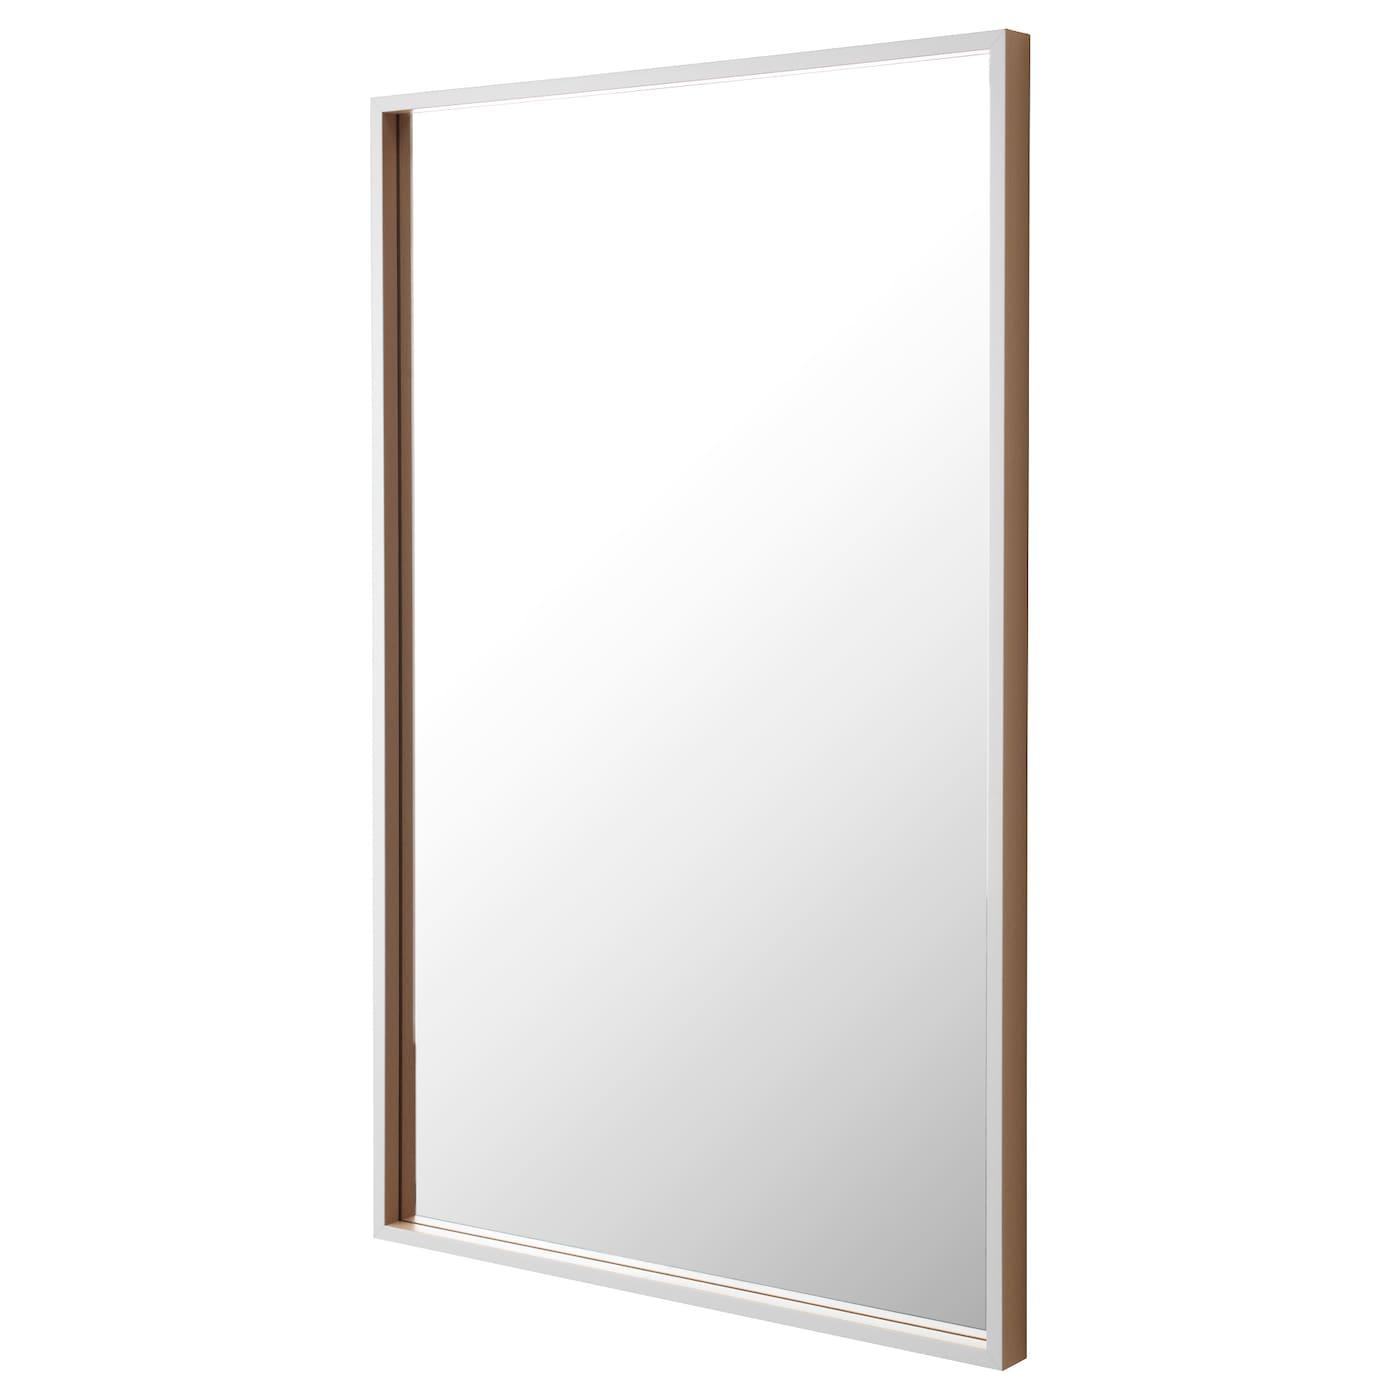 Wall mirrors ikea ireland - Espejo marco blanco ...